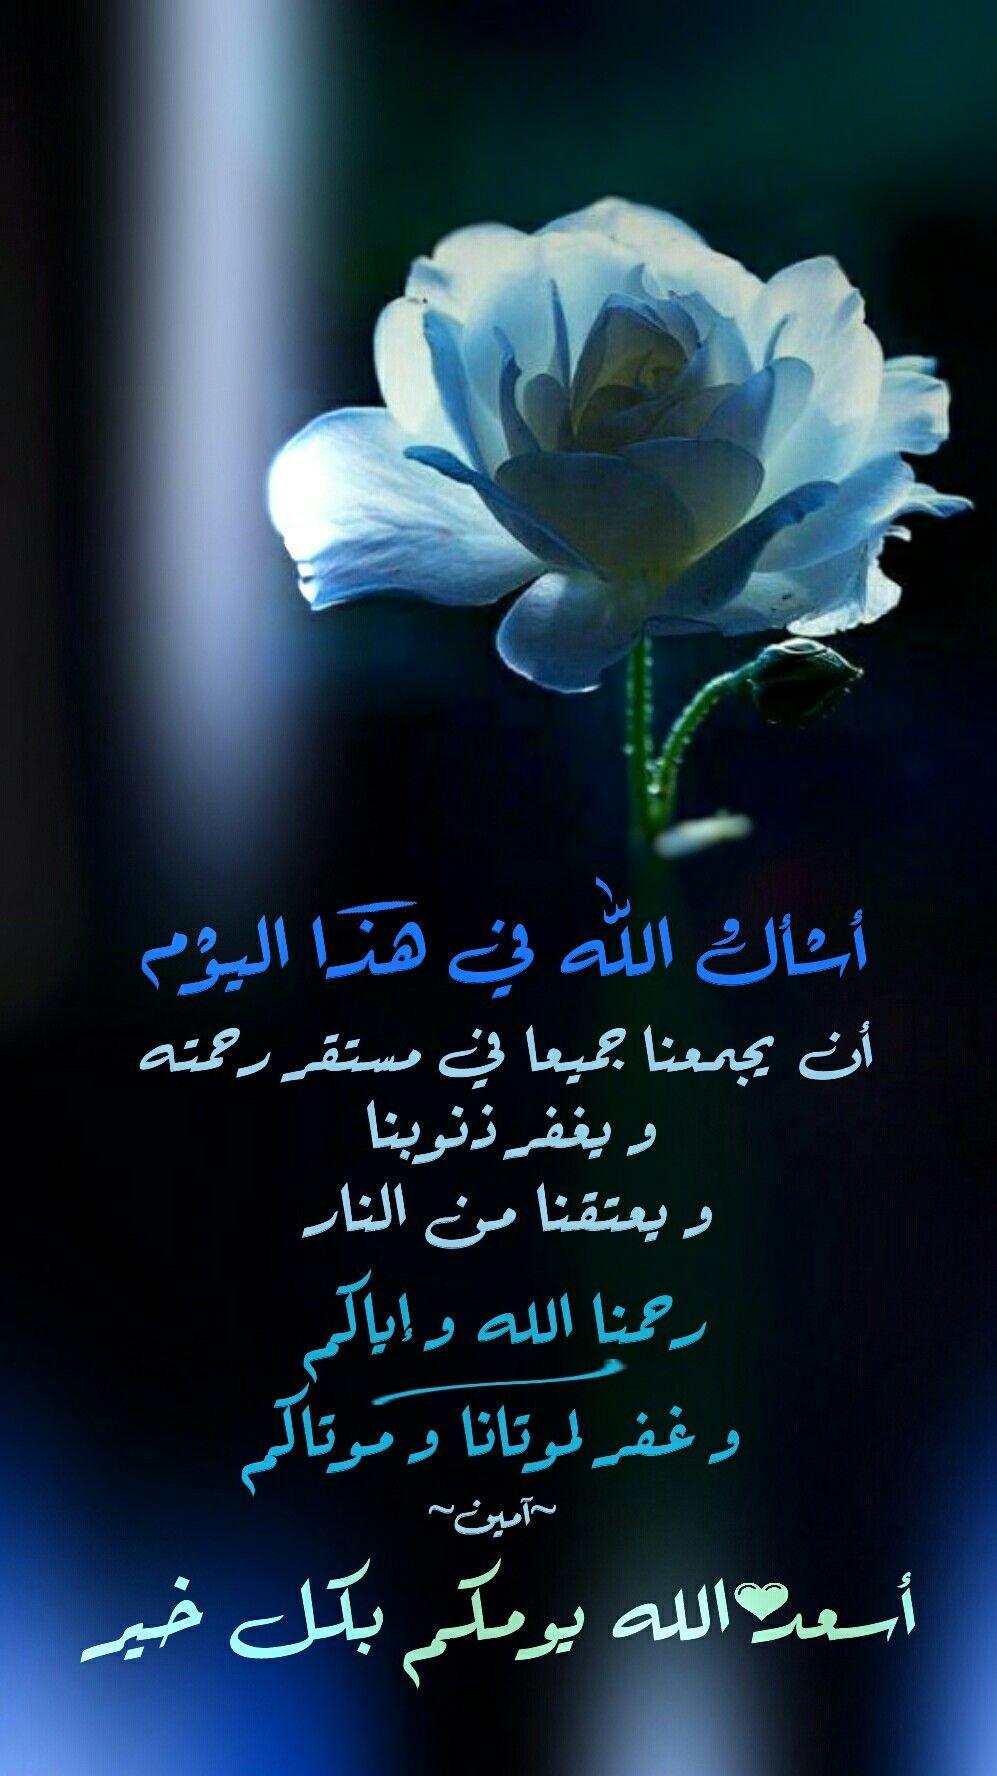 Pin By Yacine Aymen On Cerf Beautiful Morning Messages Morning Messages Good Morning Arabic